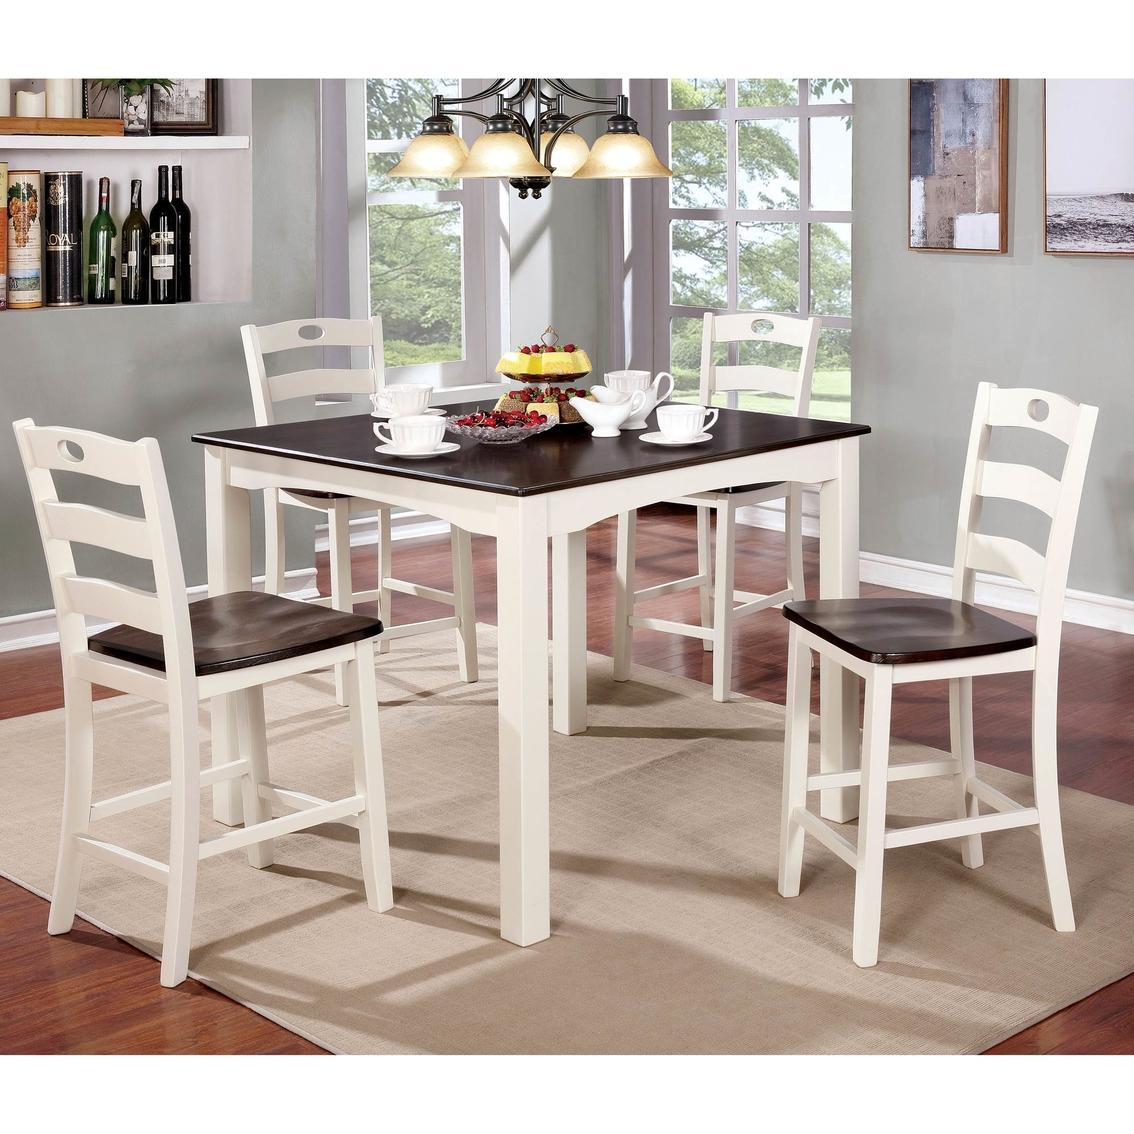 Furniture Of America Liliana 5 Pc. Pub Dining Set